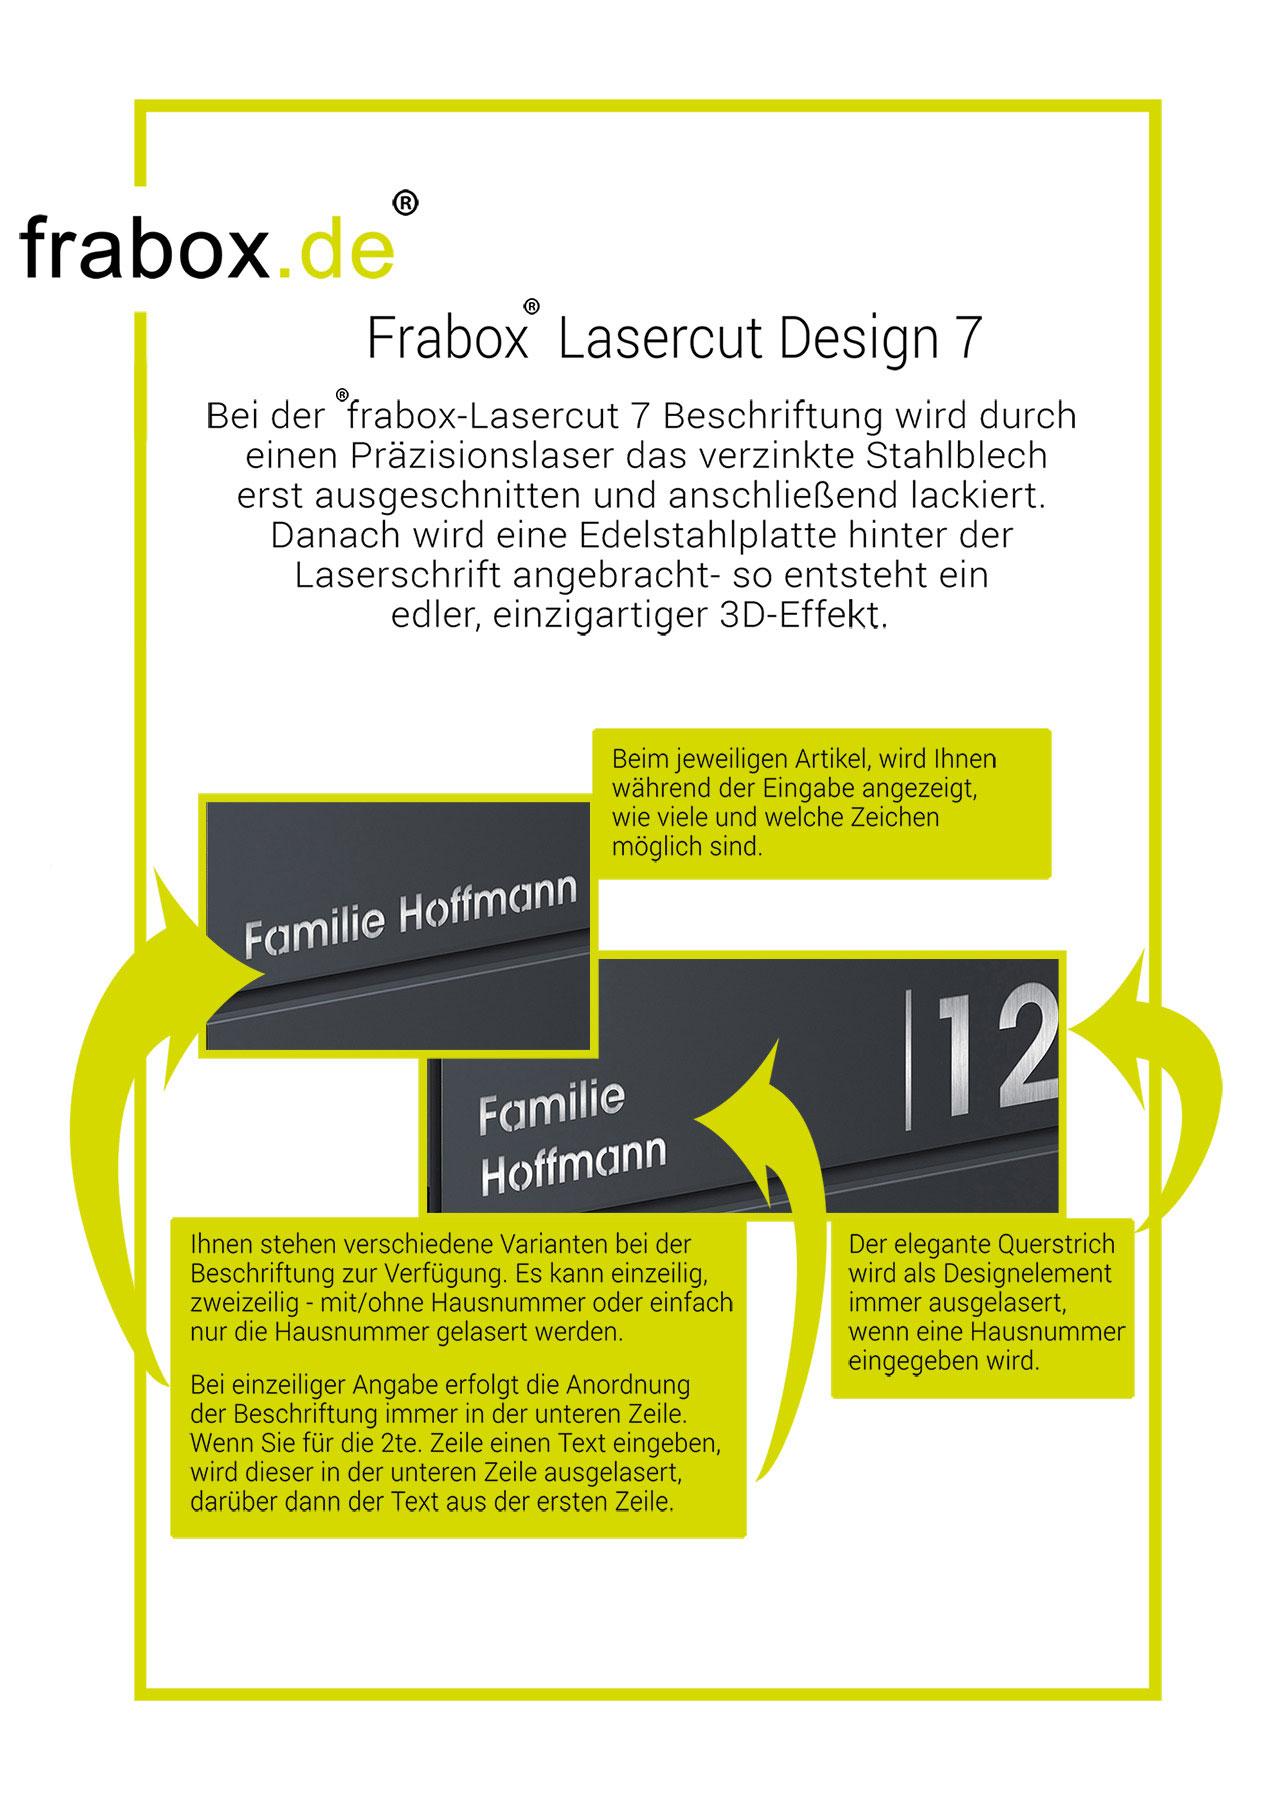 Lasercut-Design-7-FraboxfufVfc32vog4B